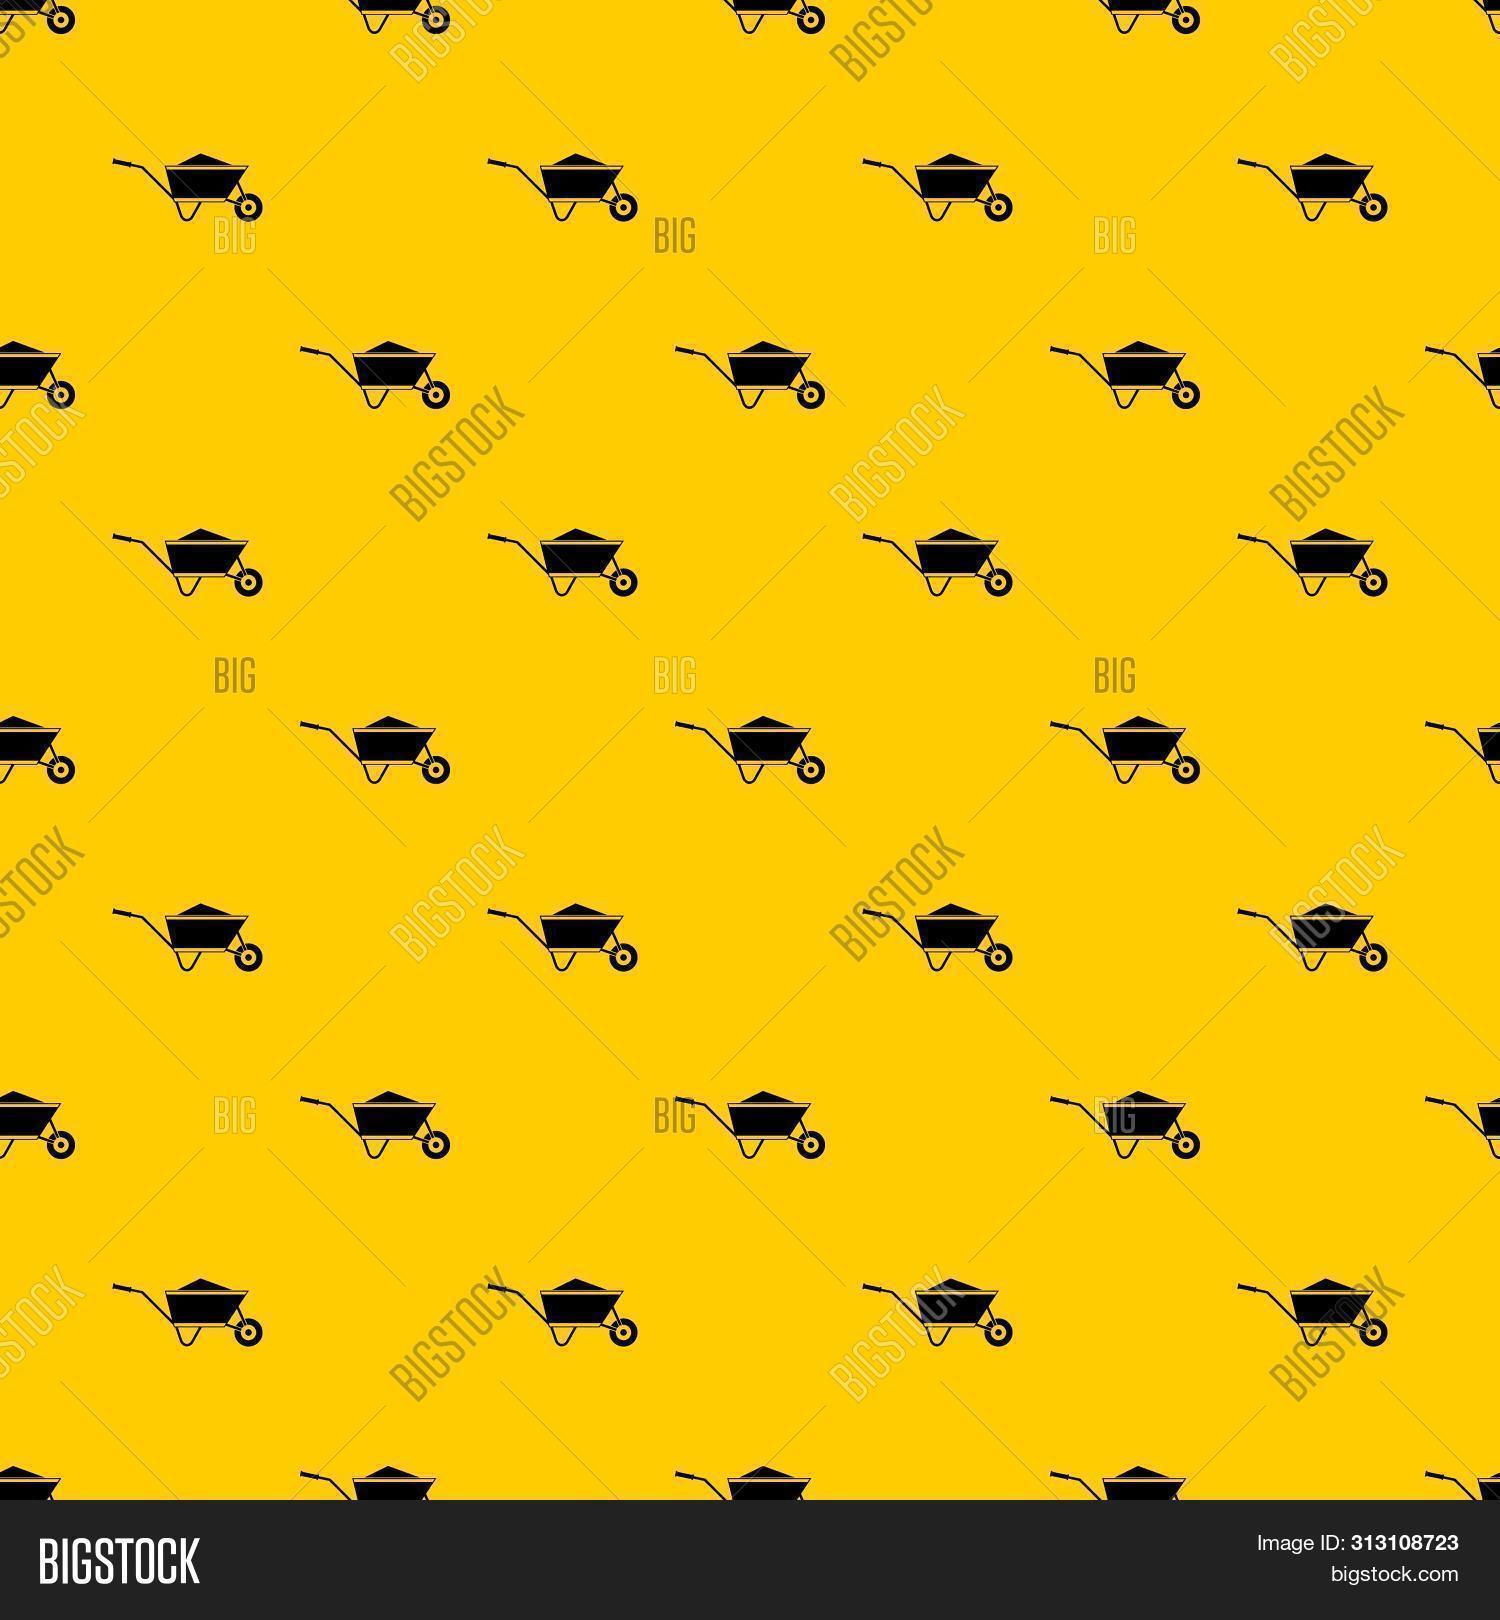 agricultural,back,background,barrow,botanical,care,cart,compost,construction,cultivated,dirt,divot,equipment,farm,farmer,garden,gardener,geometric,ground,growth,humus,land,landscape,lawn,leisure,maintenance,pattern,pitchfork,plant,repeat,repeating,rural,seamless,simple,soil,spring,summer,texture,tool,transport,transportation,vehicle,wallpaper,wheel,wheelbarrow,work,worker,working,yard,yardwork